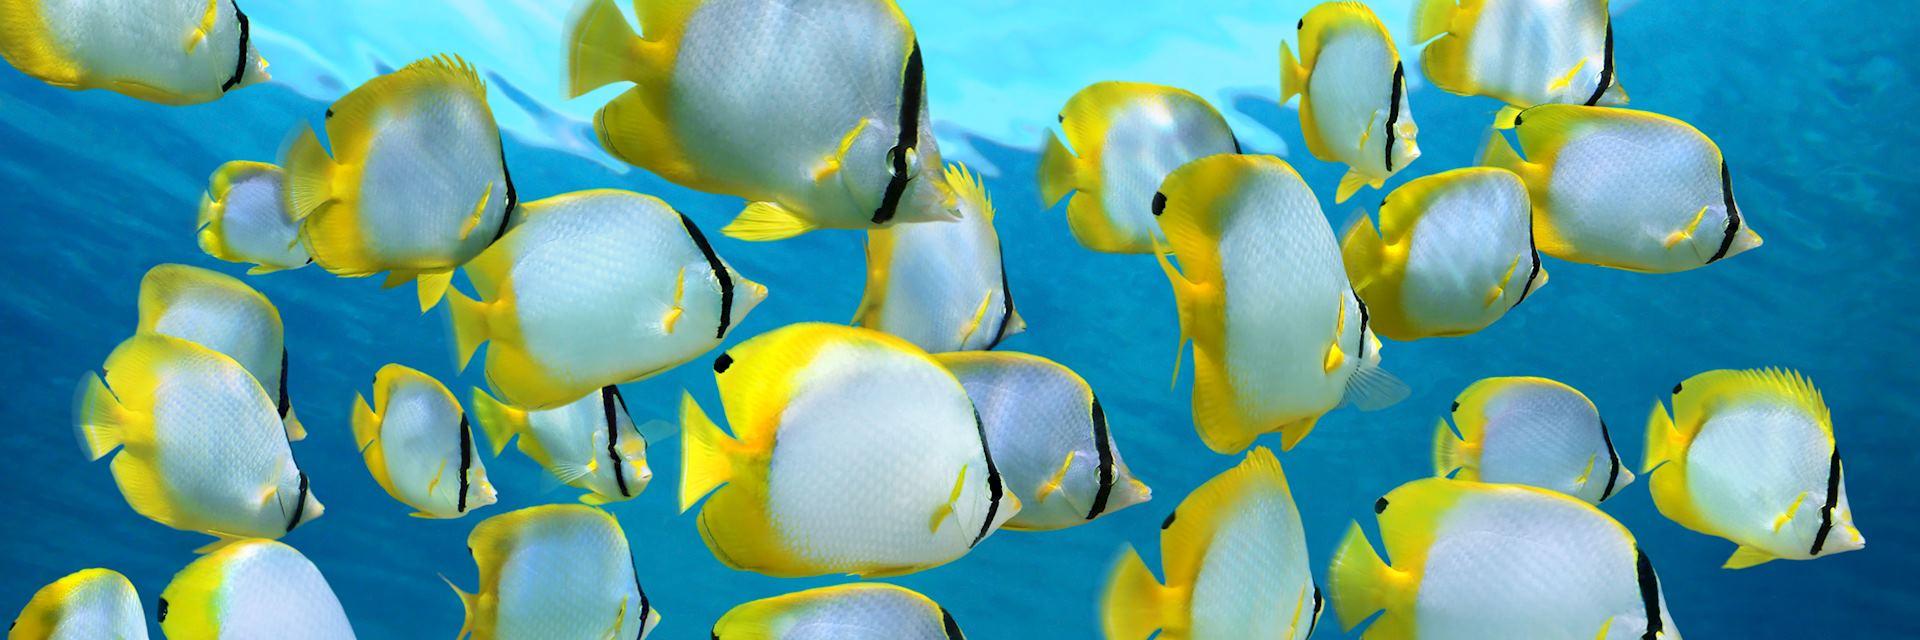 Spotfin butterflyfish, Caribbean